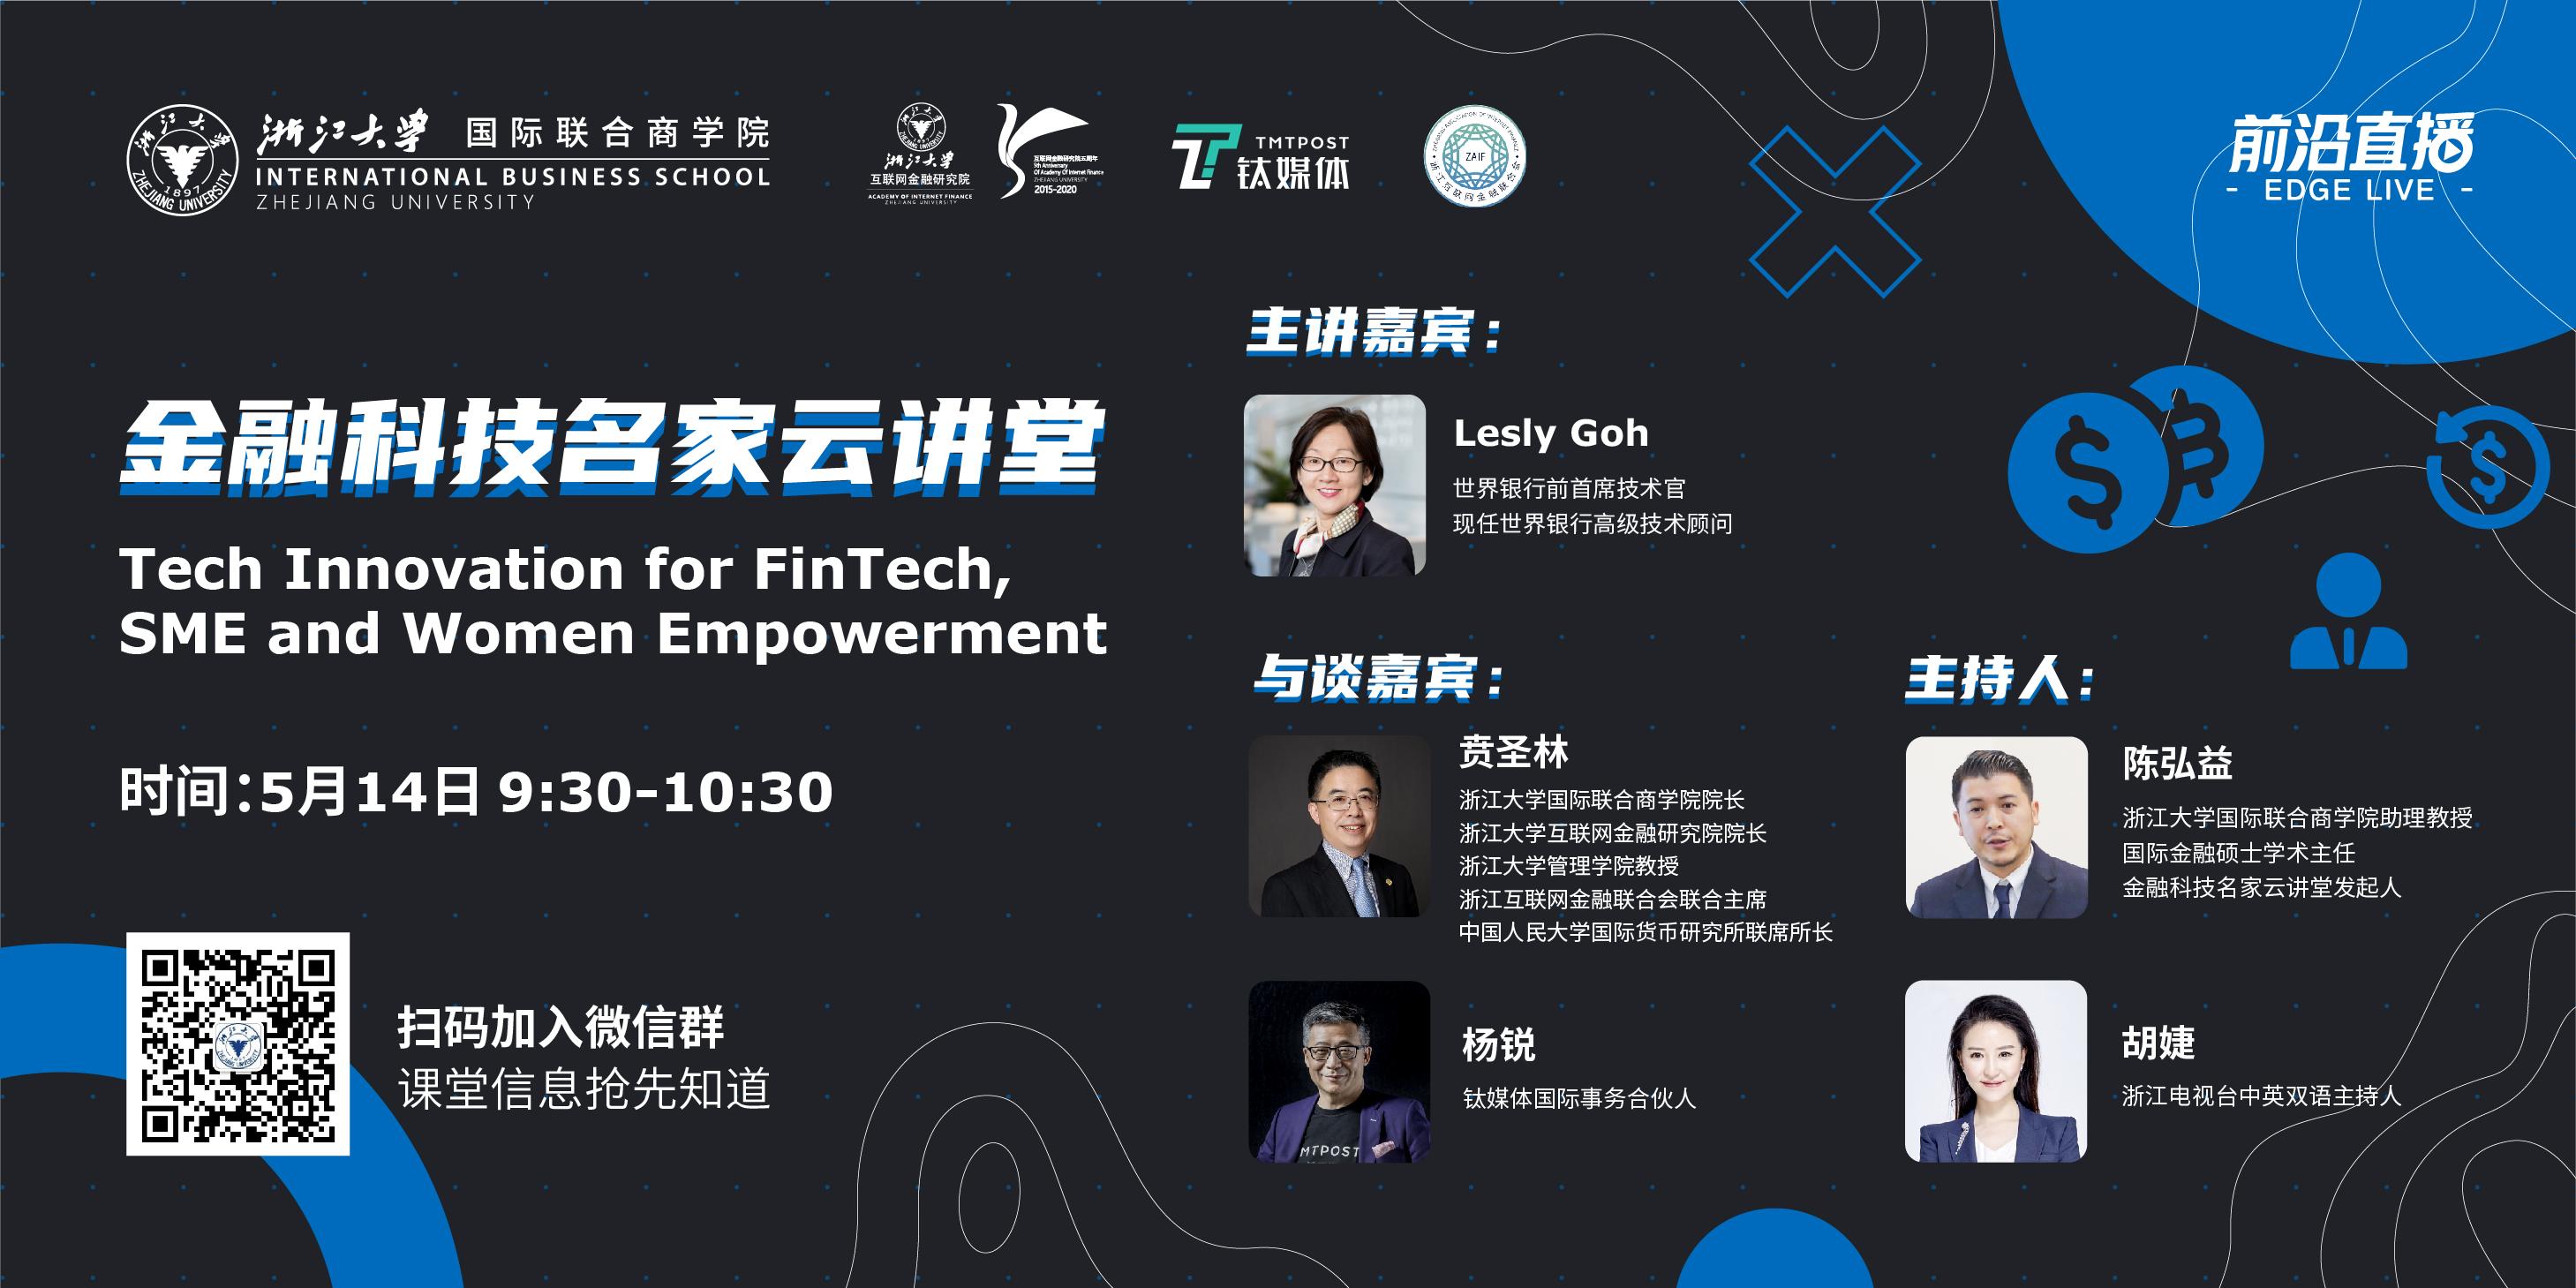 金融科技名家云讲堂①:Tech Innovation for FinTech, SME and Women Empowerment